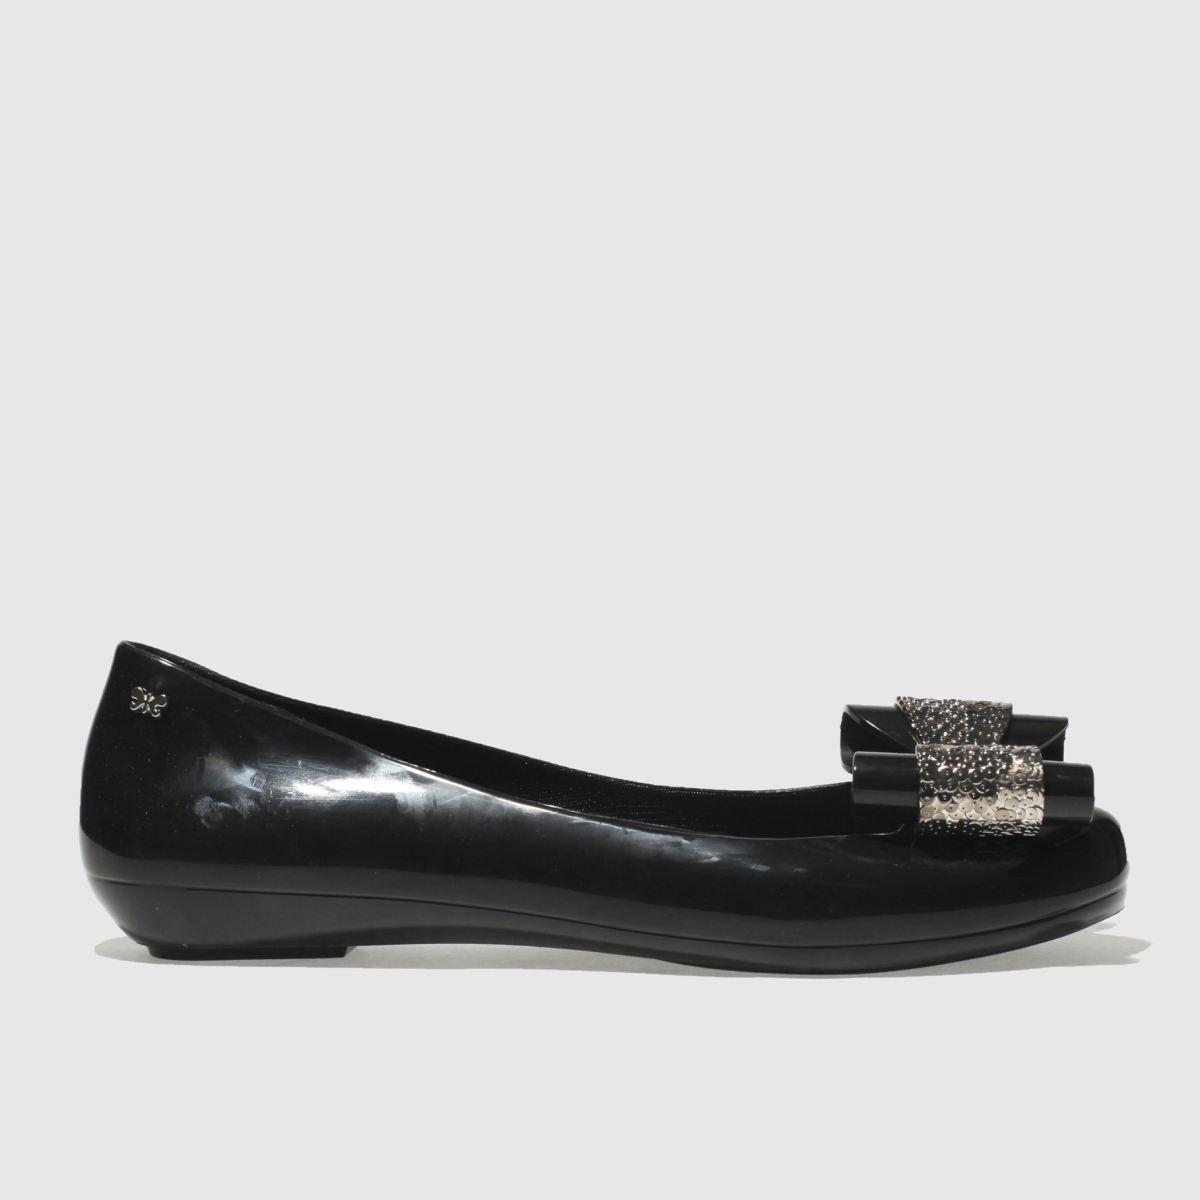 Zaxy Zaxy Black & Silver Pop Glam Flat Shoes